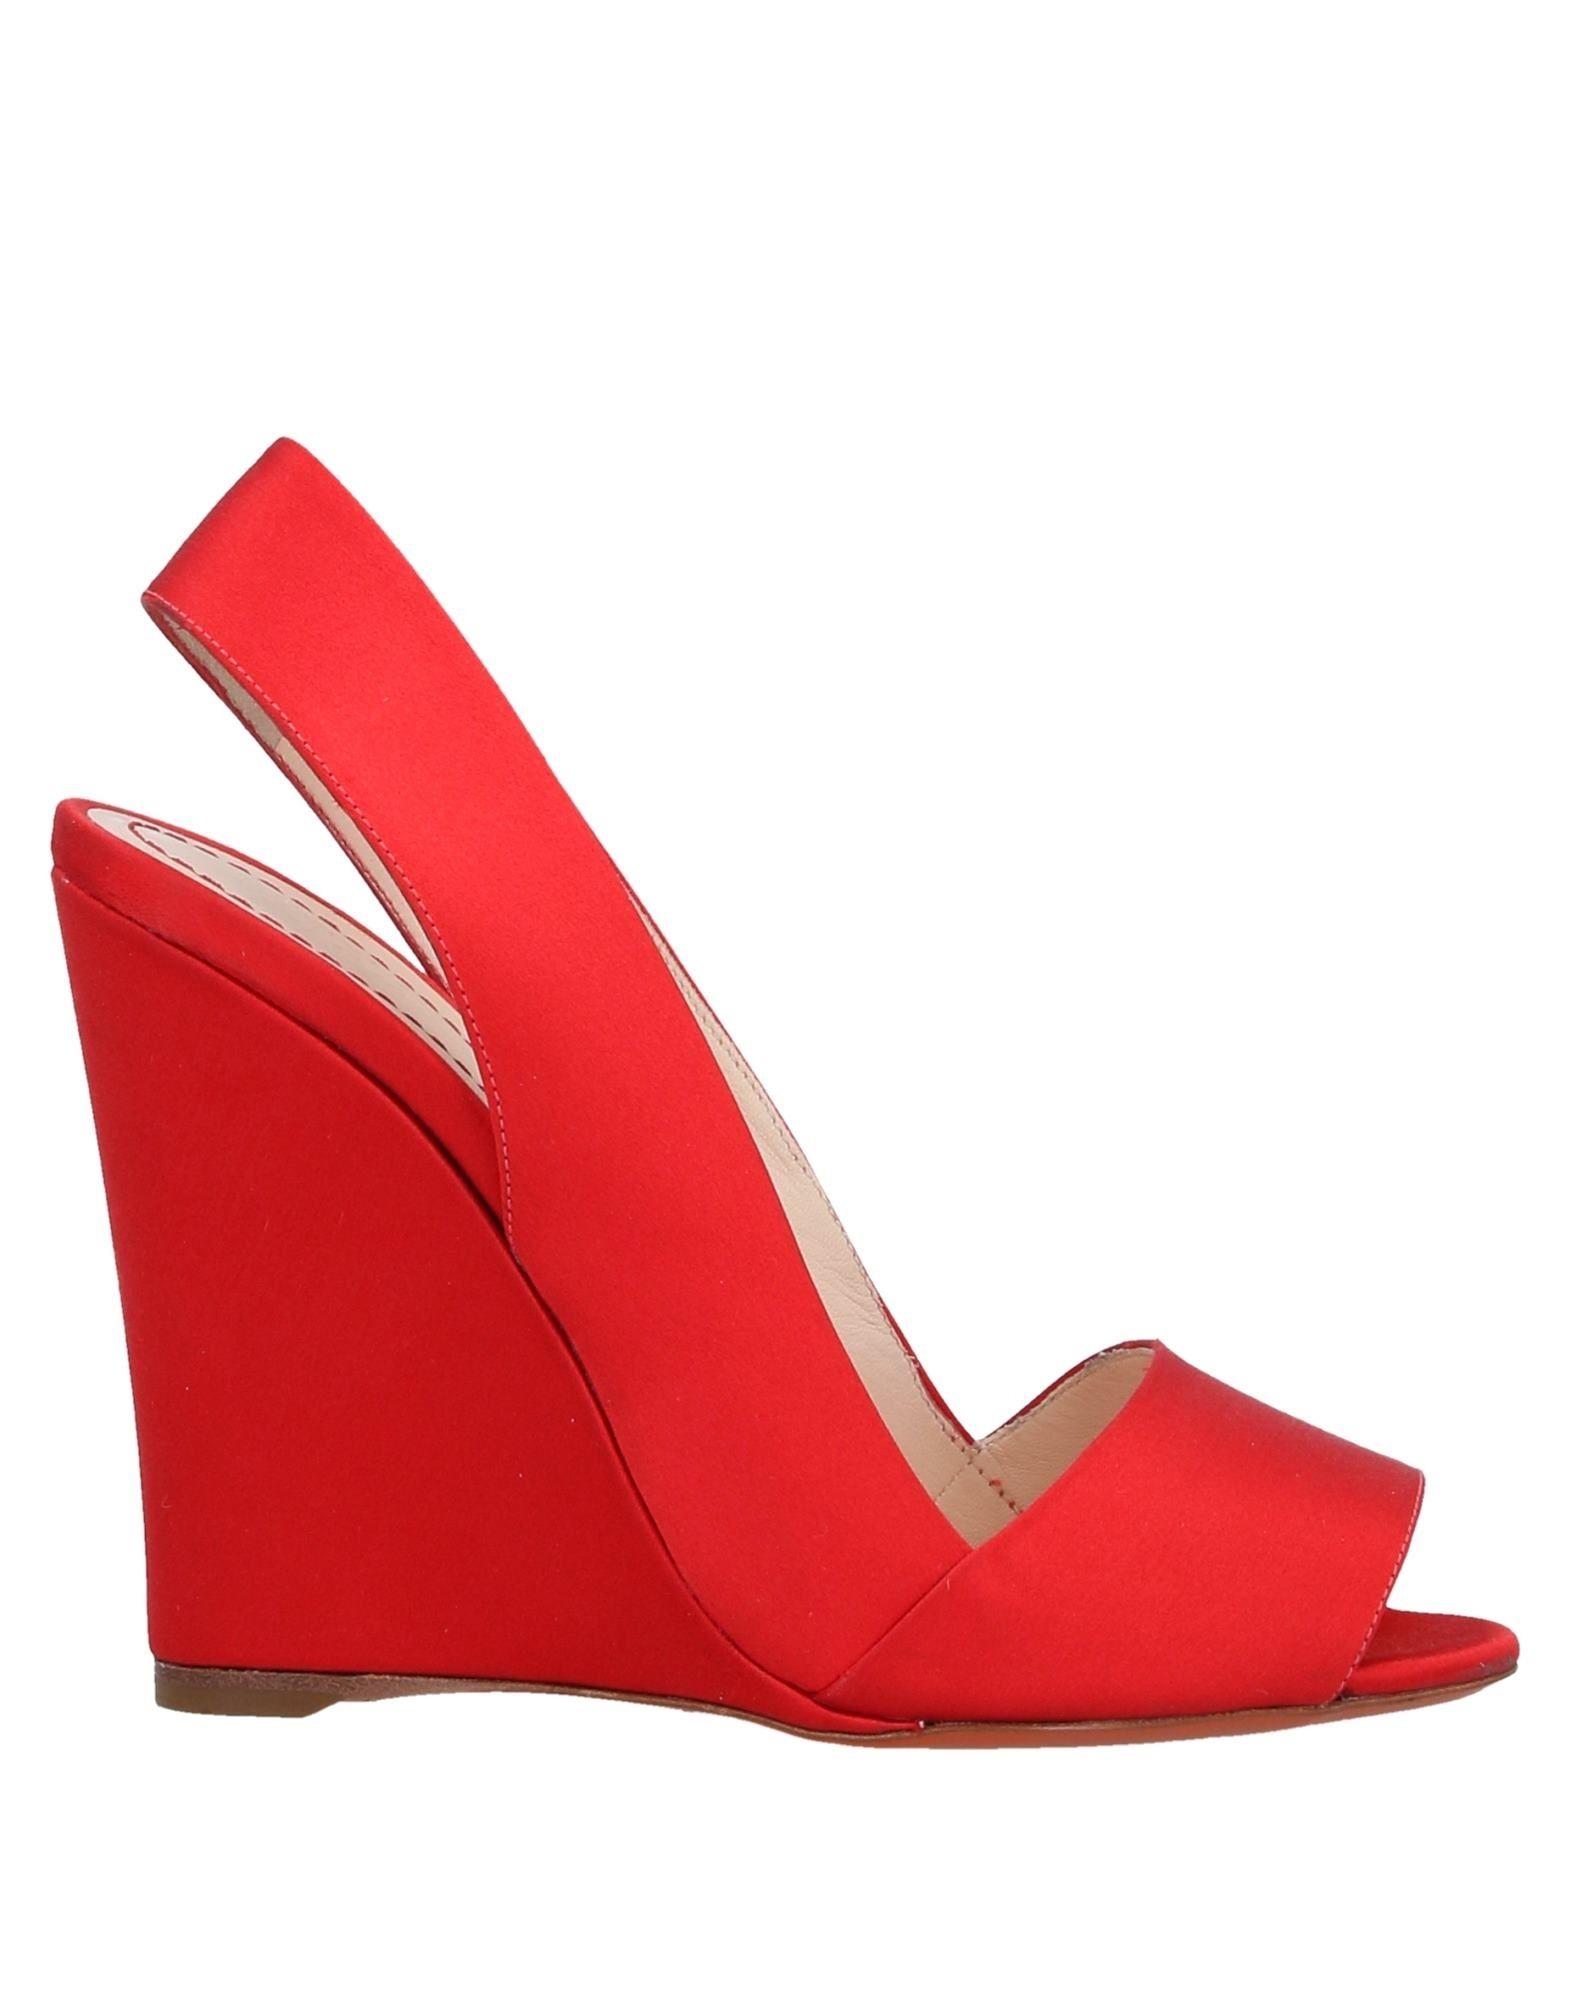 SANTONI Sandals. satin, no appliqués, solid color, narrow toeline, wedge heel, leather lining, leather sole, contains non-textile parts of animal origin, large sized. Textile fibers